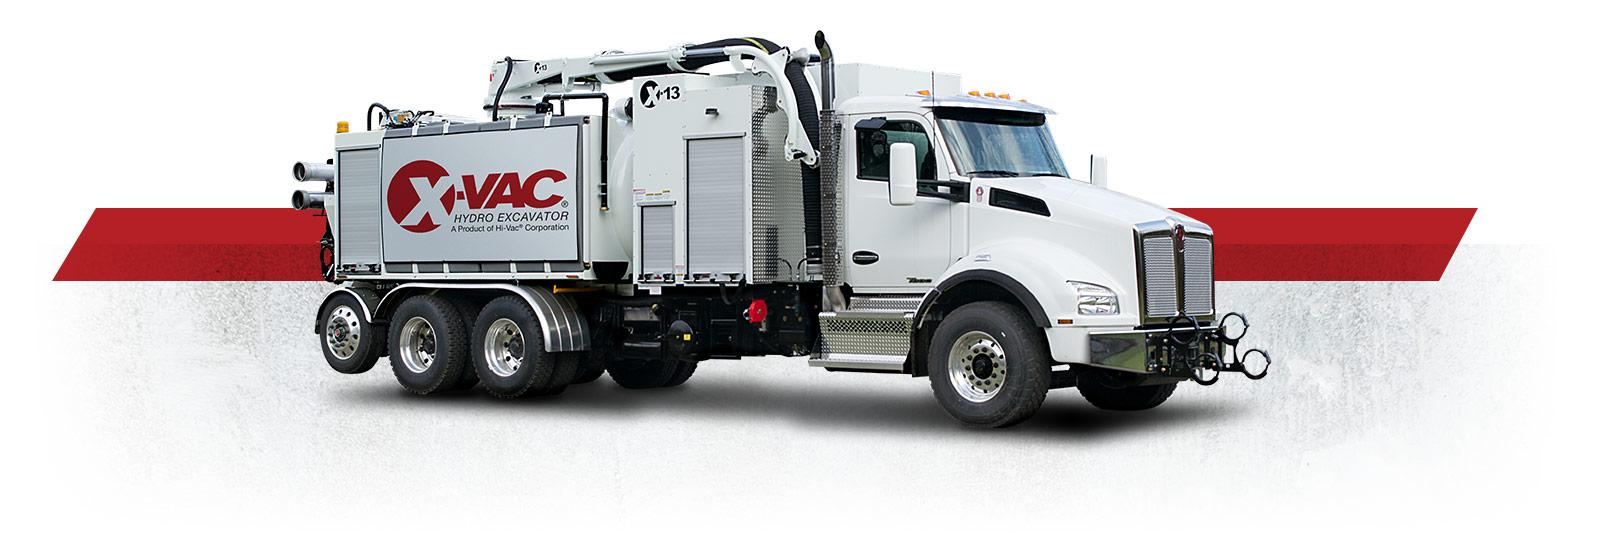 X-Vac Hydro Excavator Trucks